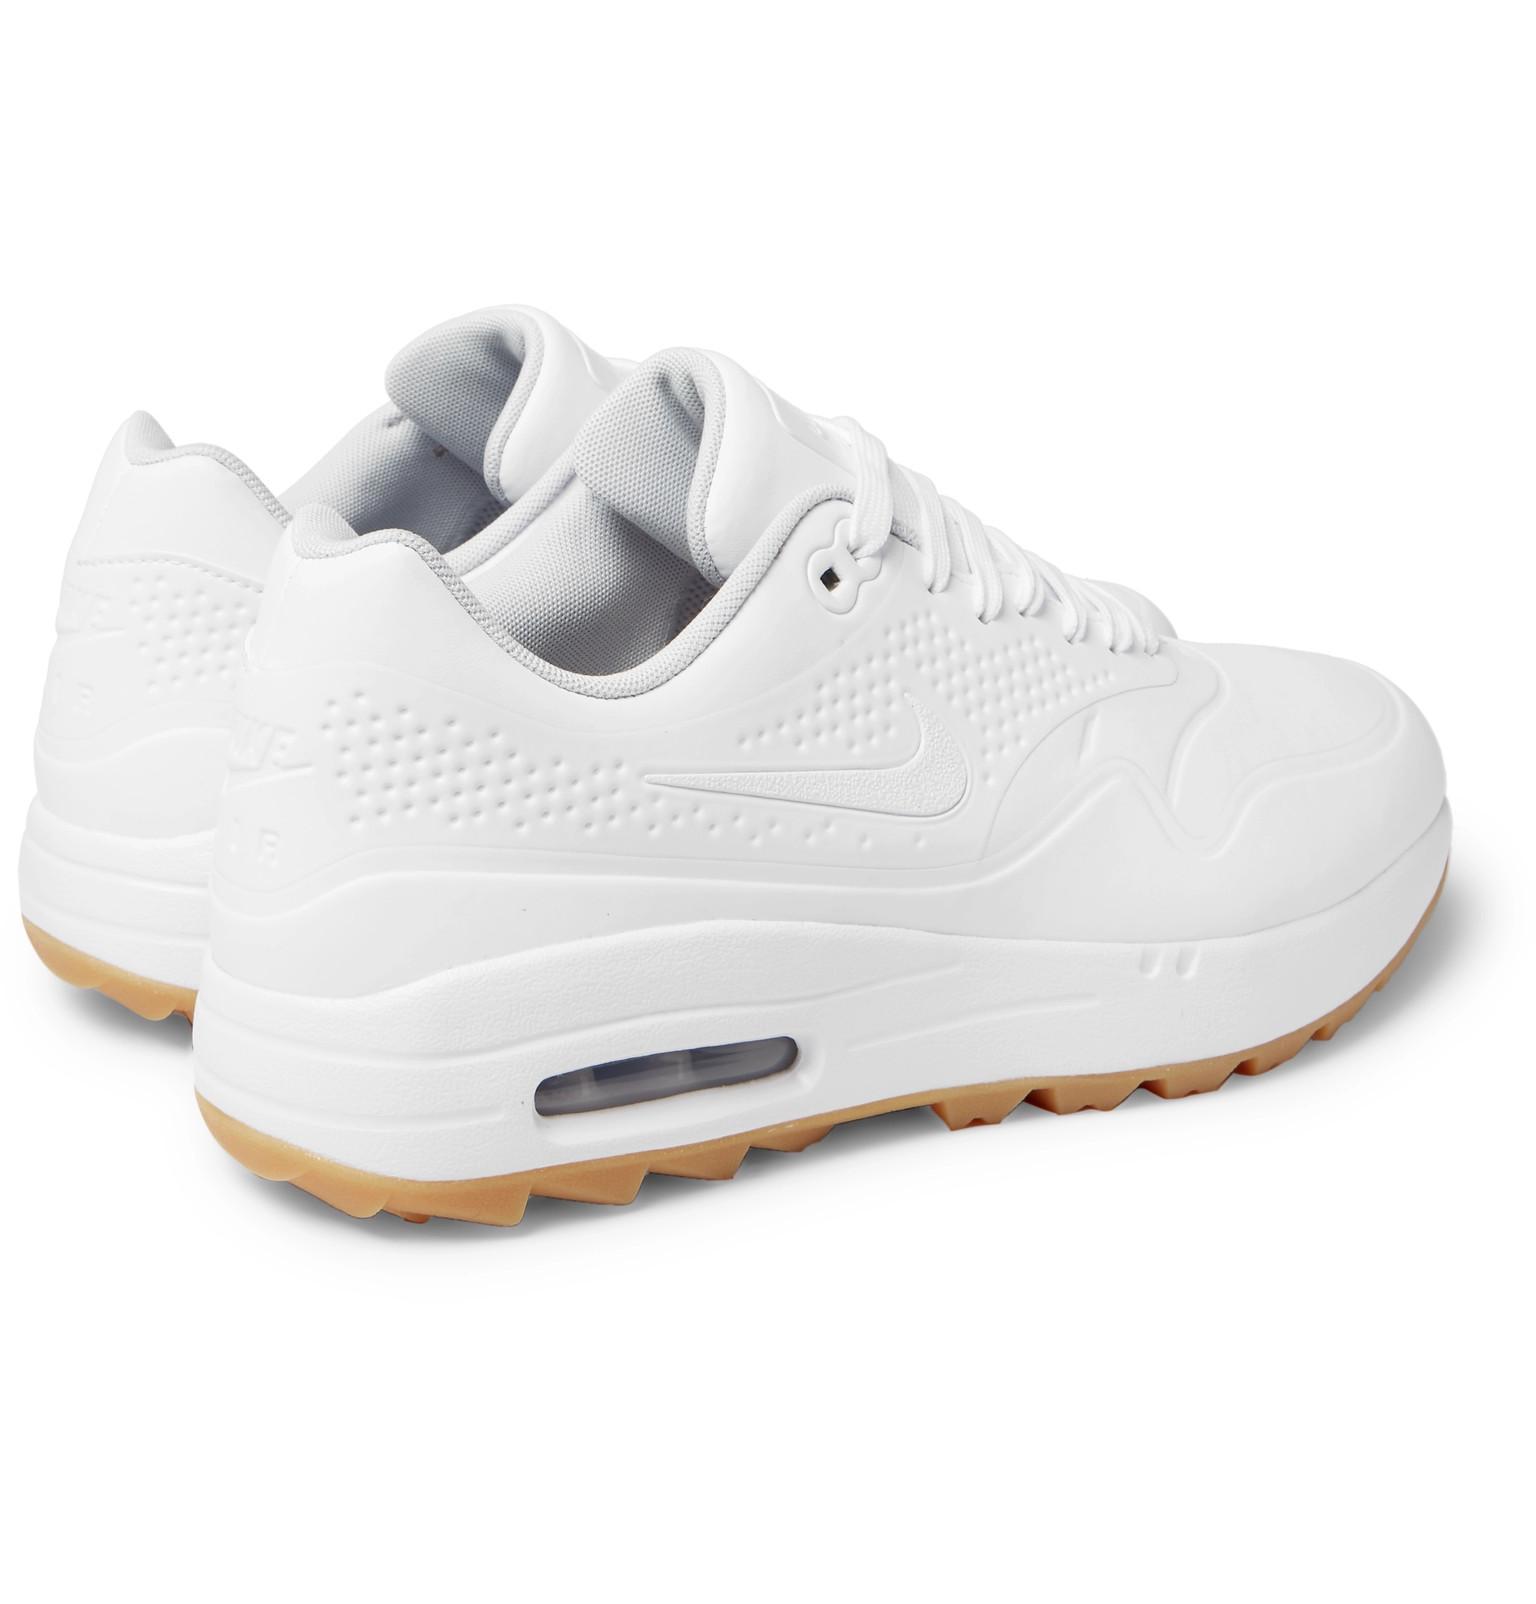 9e828ac83f7c Nike - White Air Max 1g Coated Mesh Golf Shoes for Men - Lyst. View  fullscreen